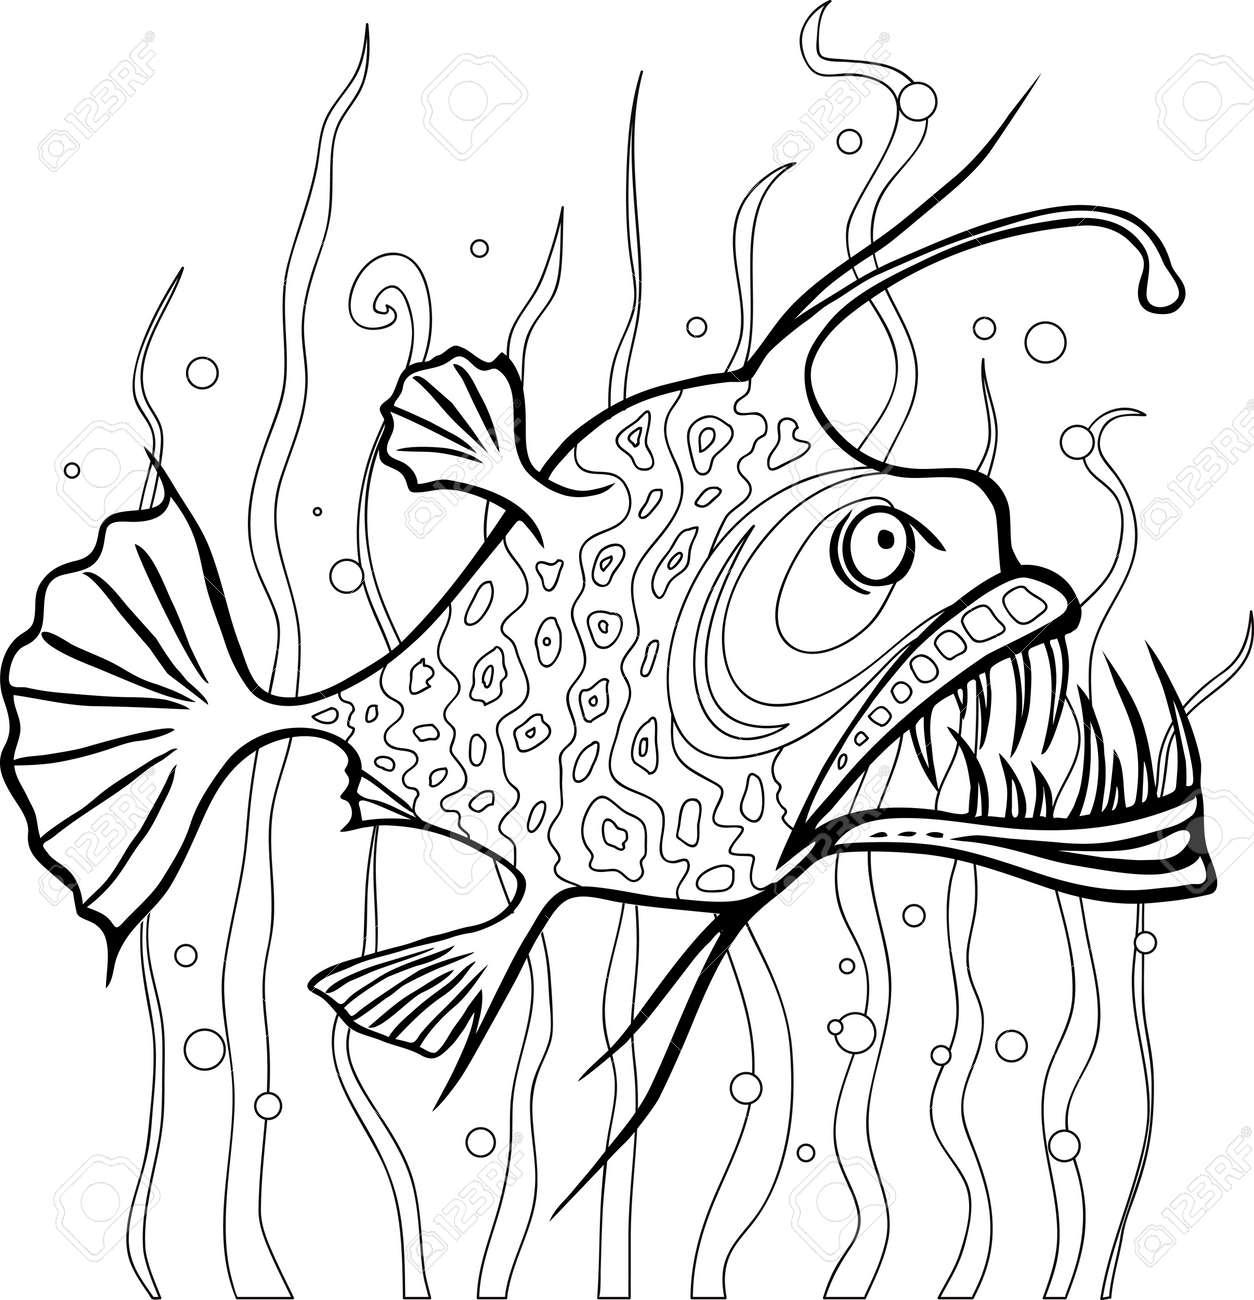 Anglerfisch Malvorlage Coloring And Malvorlagan